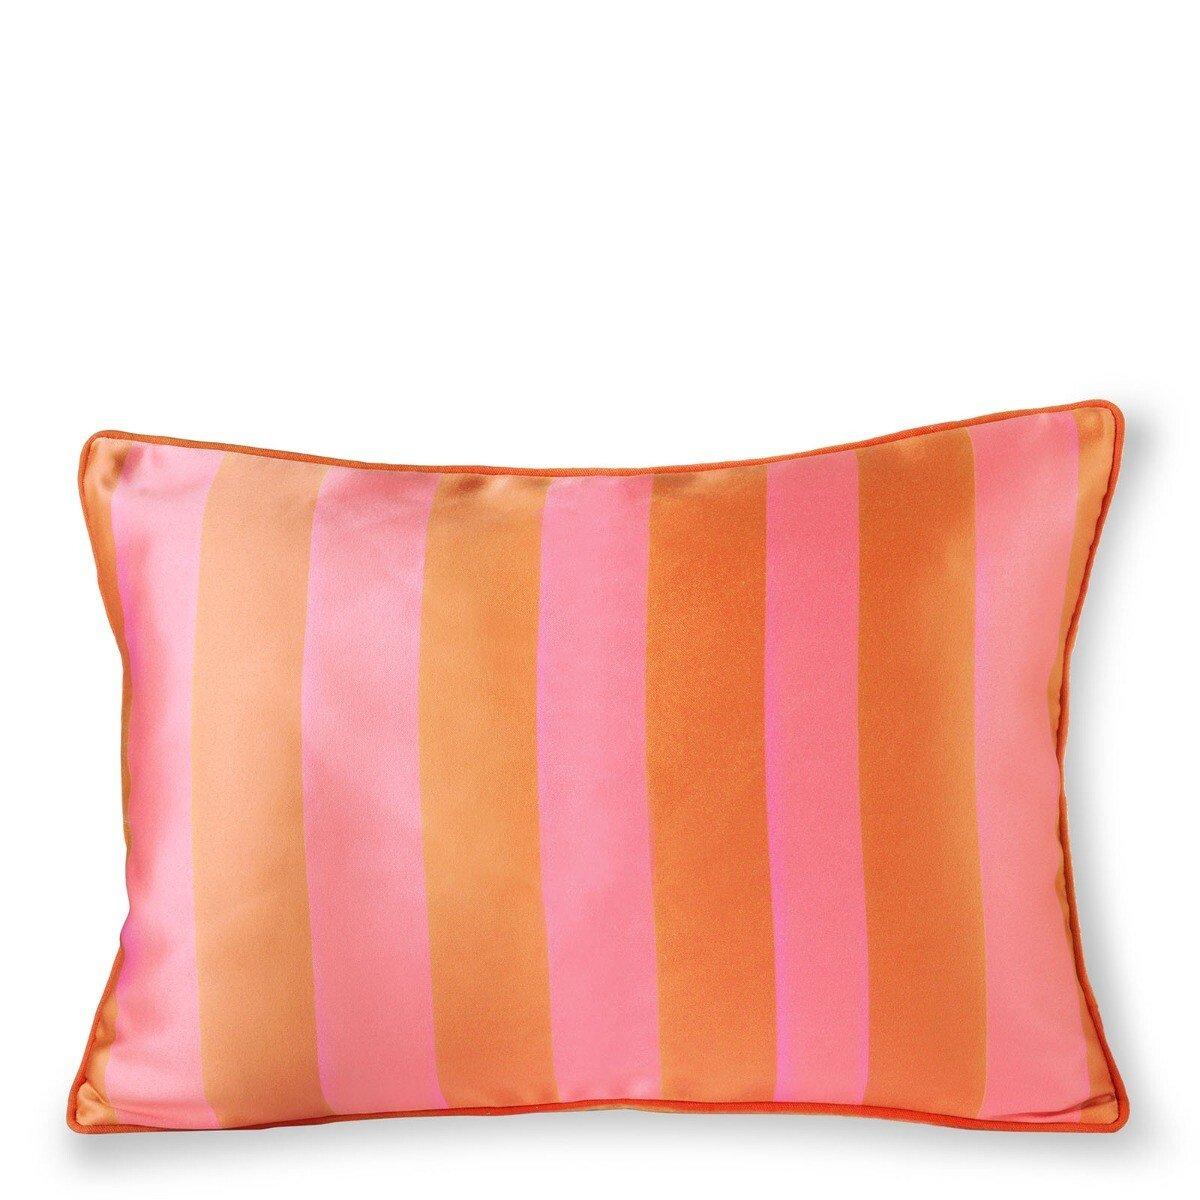 HKliving Kussen Orange Pink Satijn Velvet 35 x 50